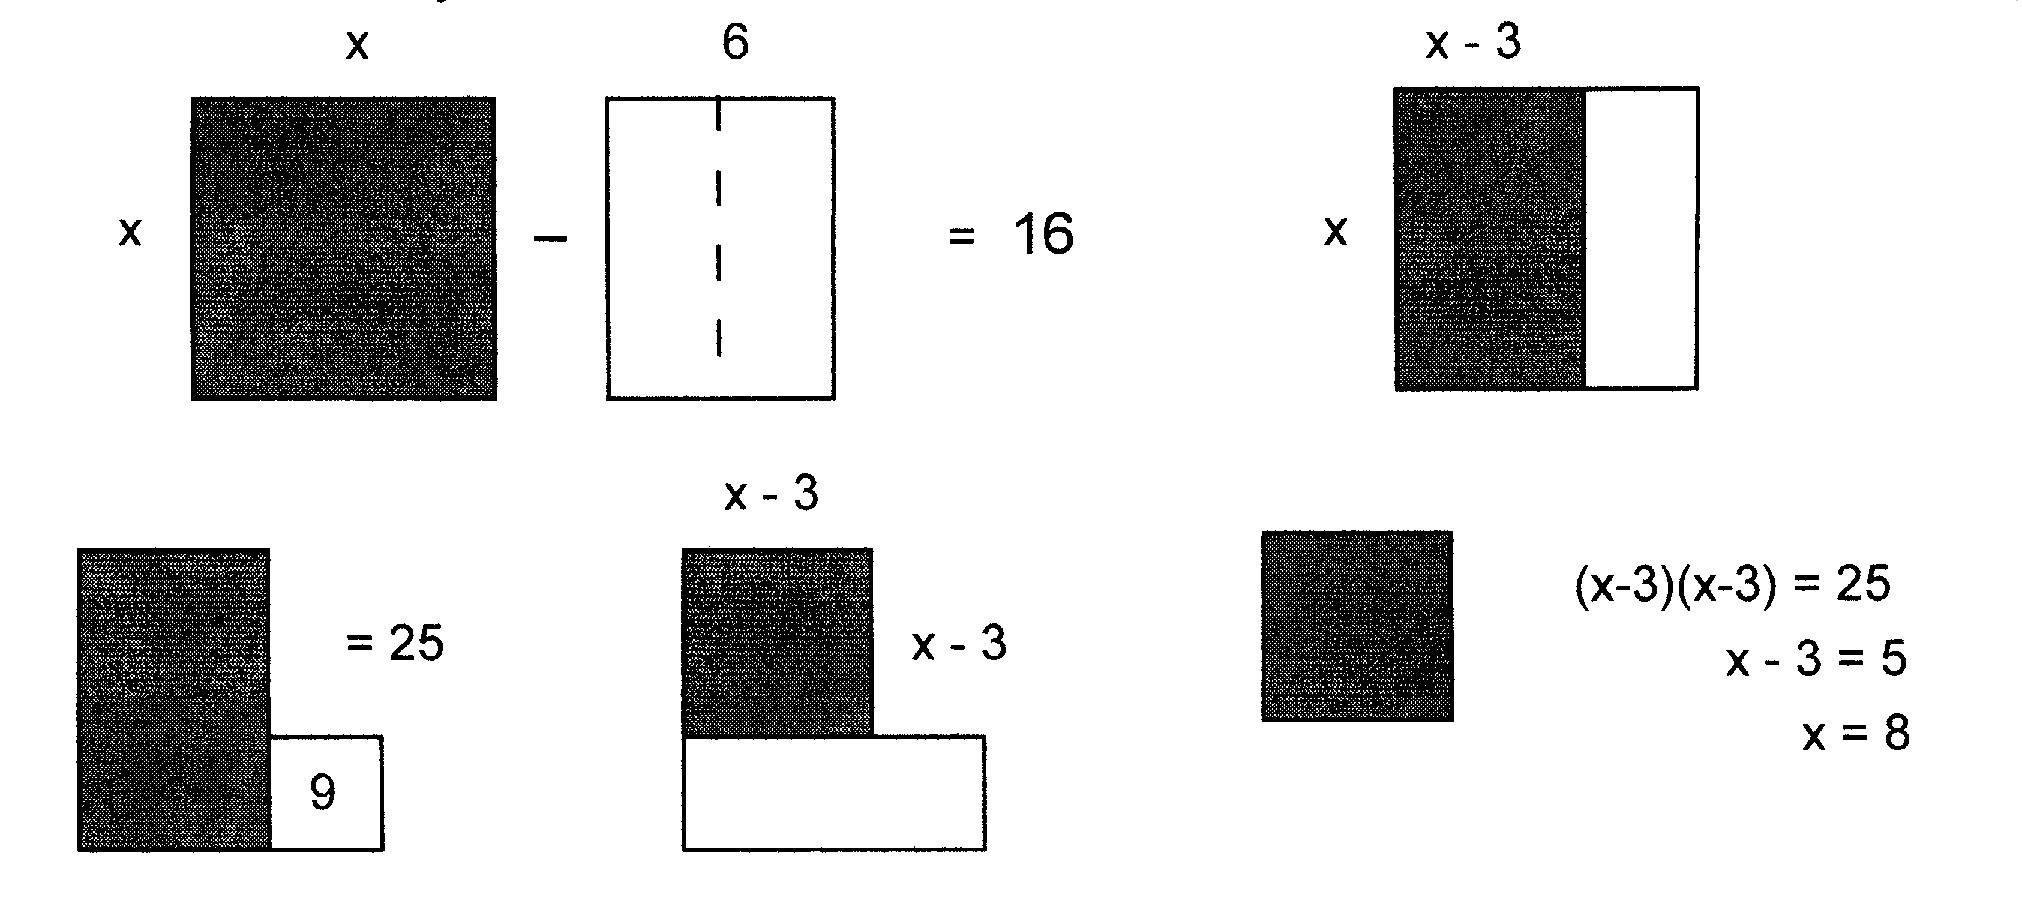 Write A C Program To Solve Quadratic Equation Using Completing The Square Method